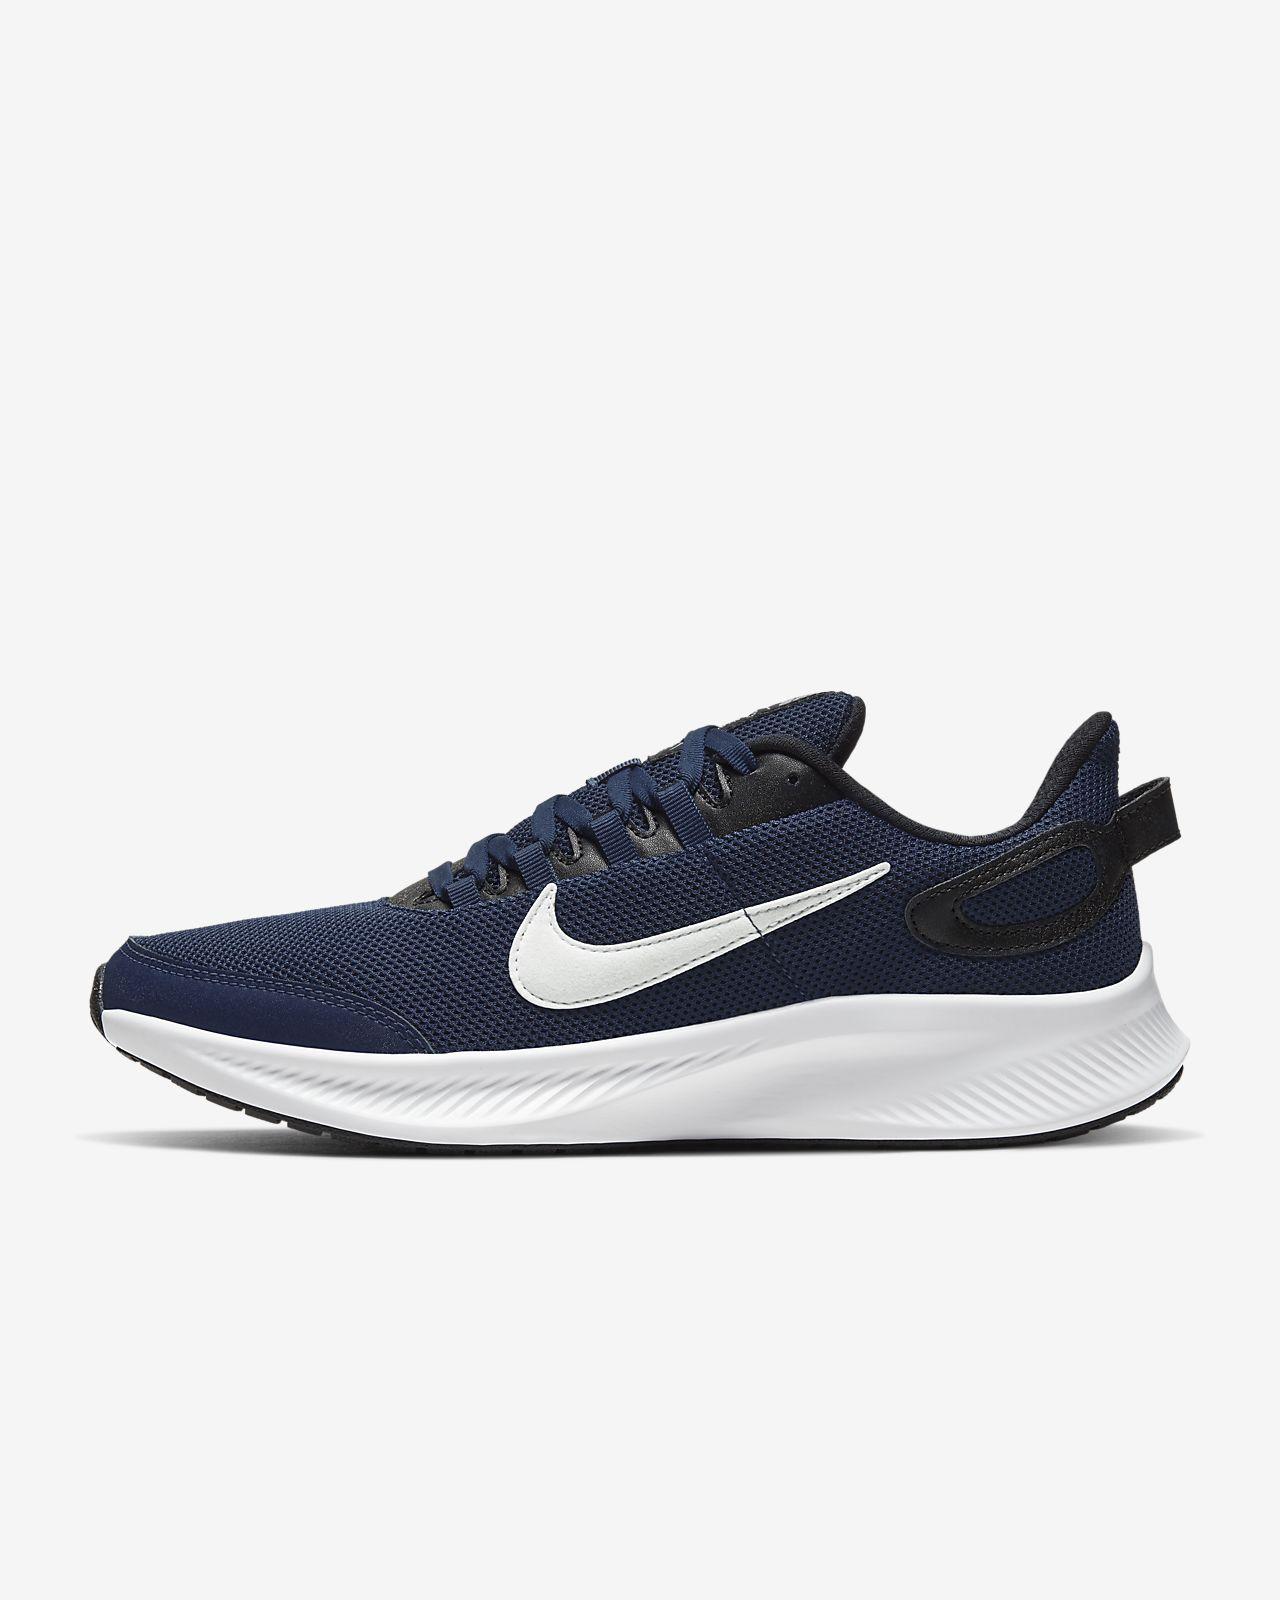 Nike Run All Day 2 Herren-Laufschuh